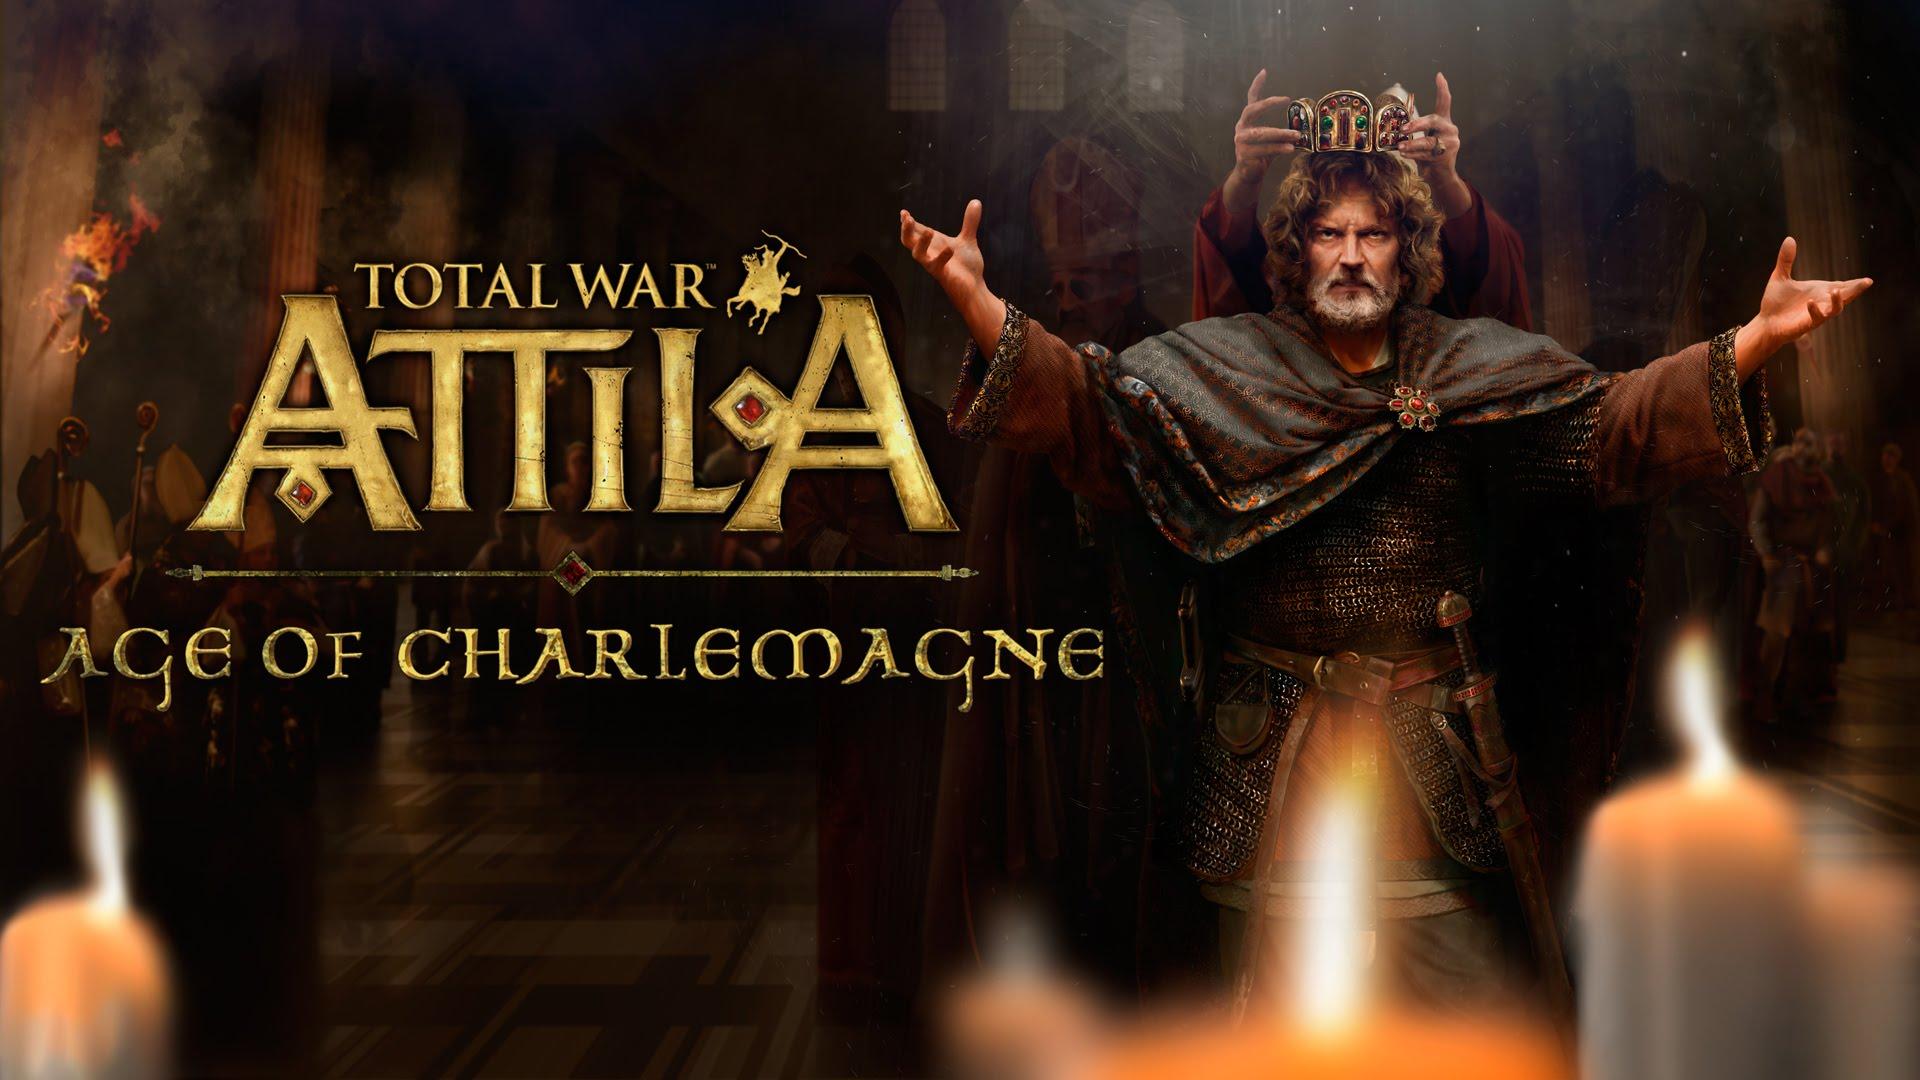 Total War: Attila- Age of Charlemagne – Guerre et Paix